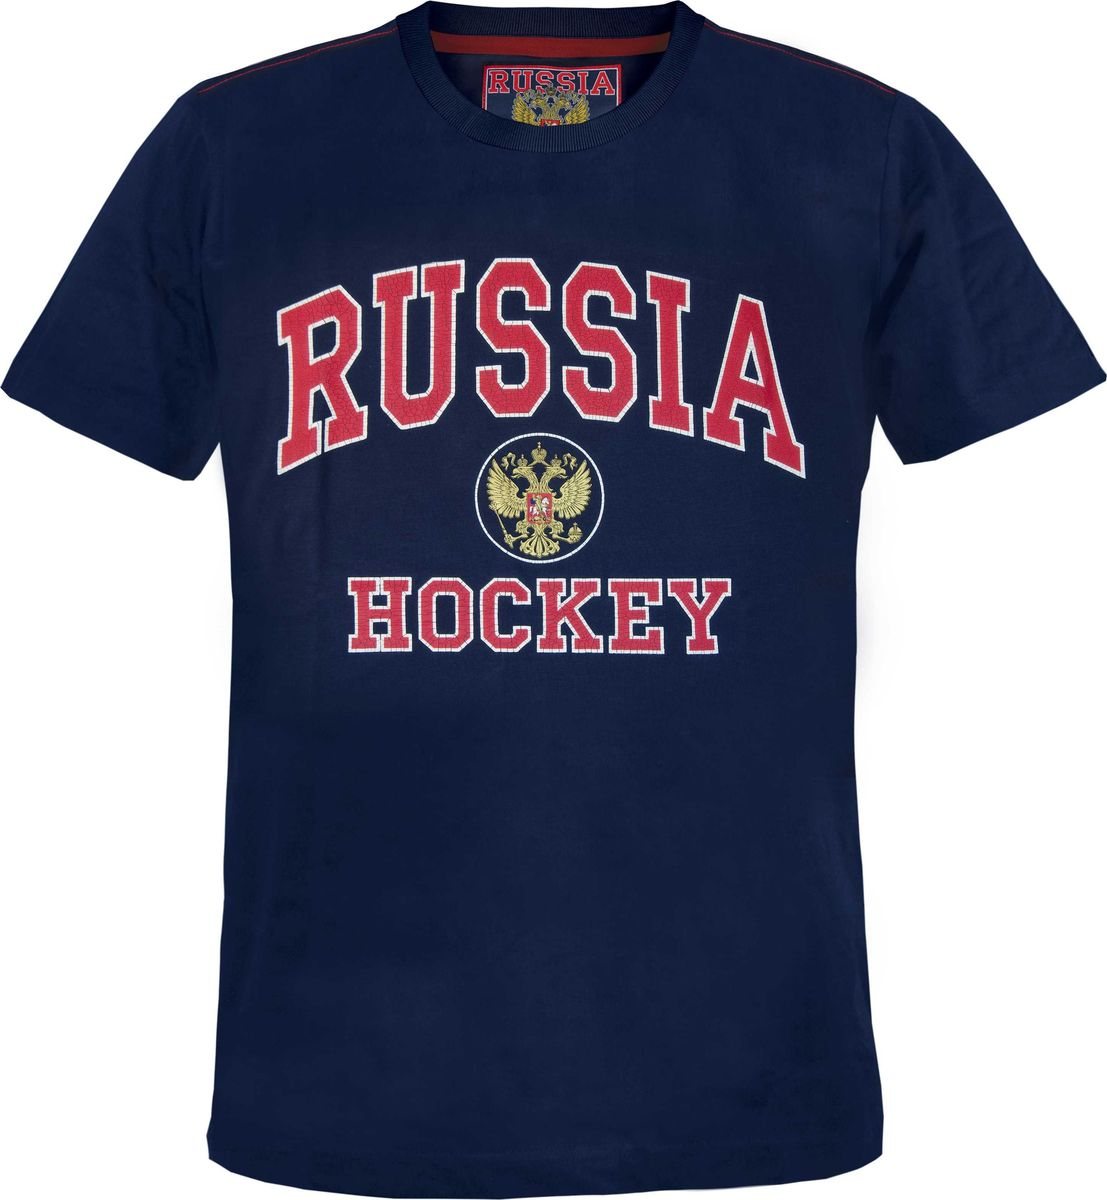 Футболка мужская Atributika & Club Россия, цвет: темно-синий. 131800. Размер S (46)131800